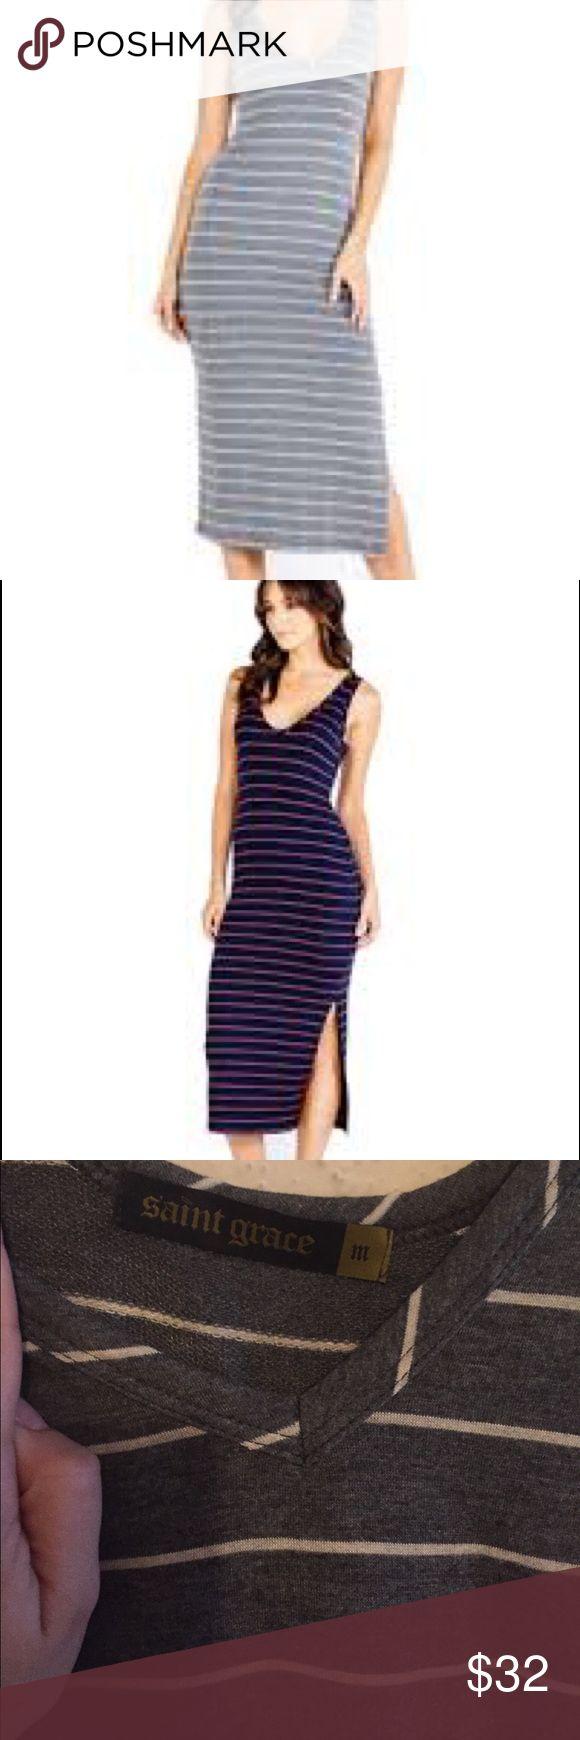 Saint grace midi dress NWOT Saint grace midi charcoal striped dress NWOT. Love this dress, but it doesn't fit me :( saint grace Dresses Midi